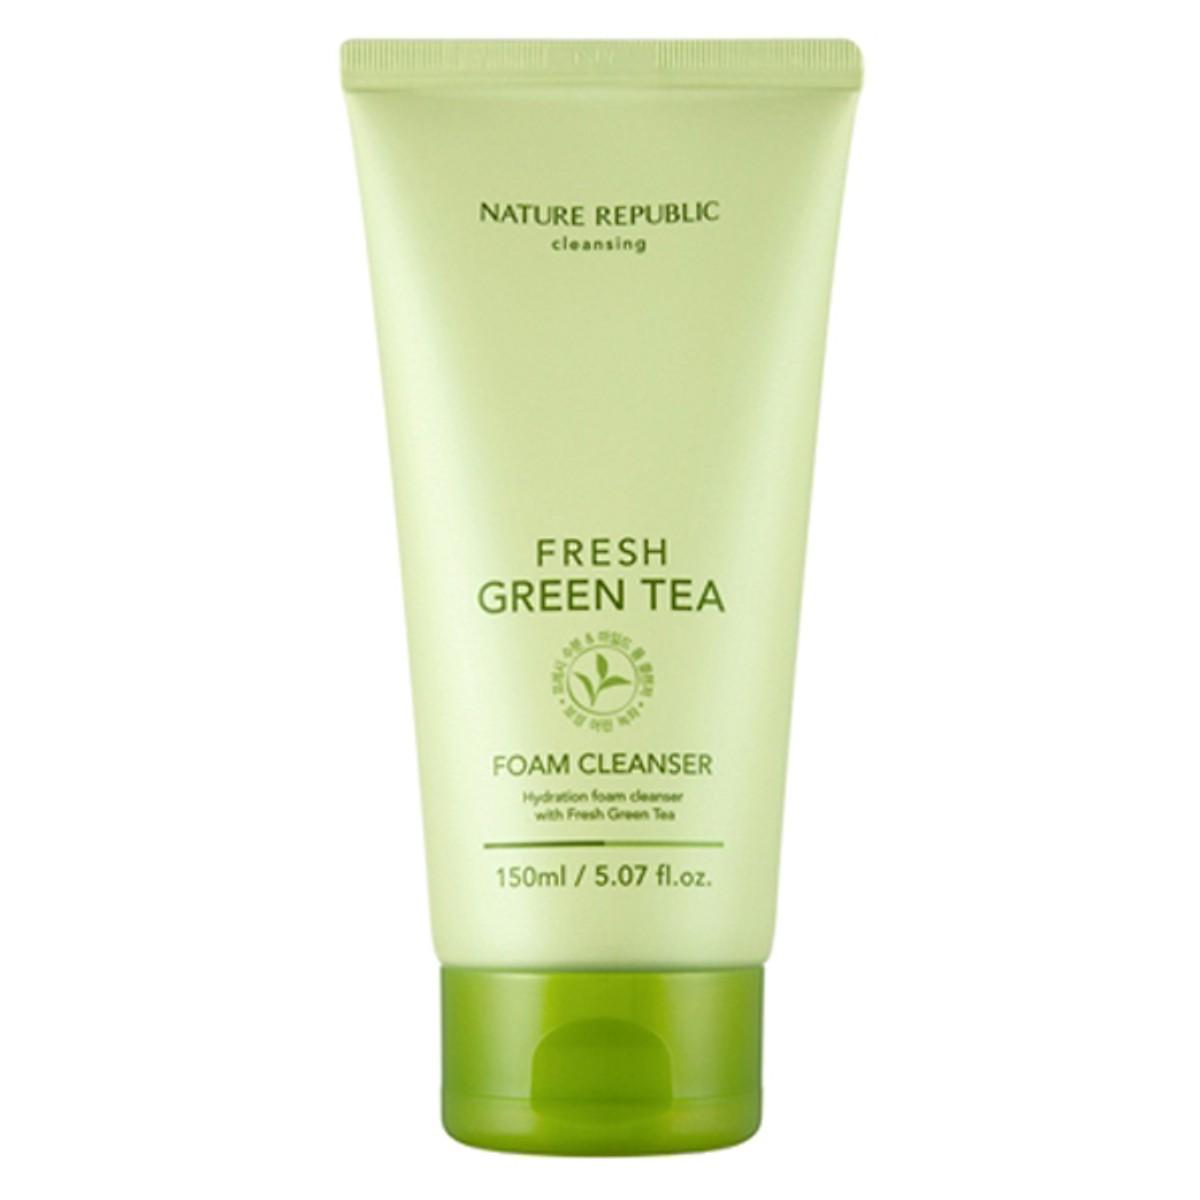 Sữa Rửa Mặt Trà Xanh Nature Republic Fresh Green Tea Foam Cleanser (150ml)